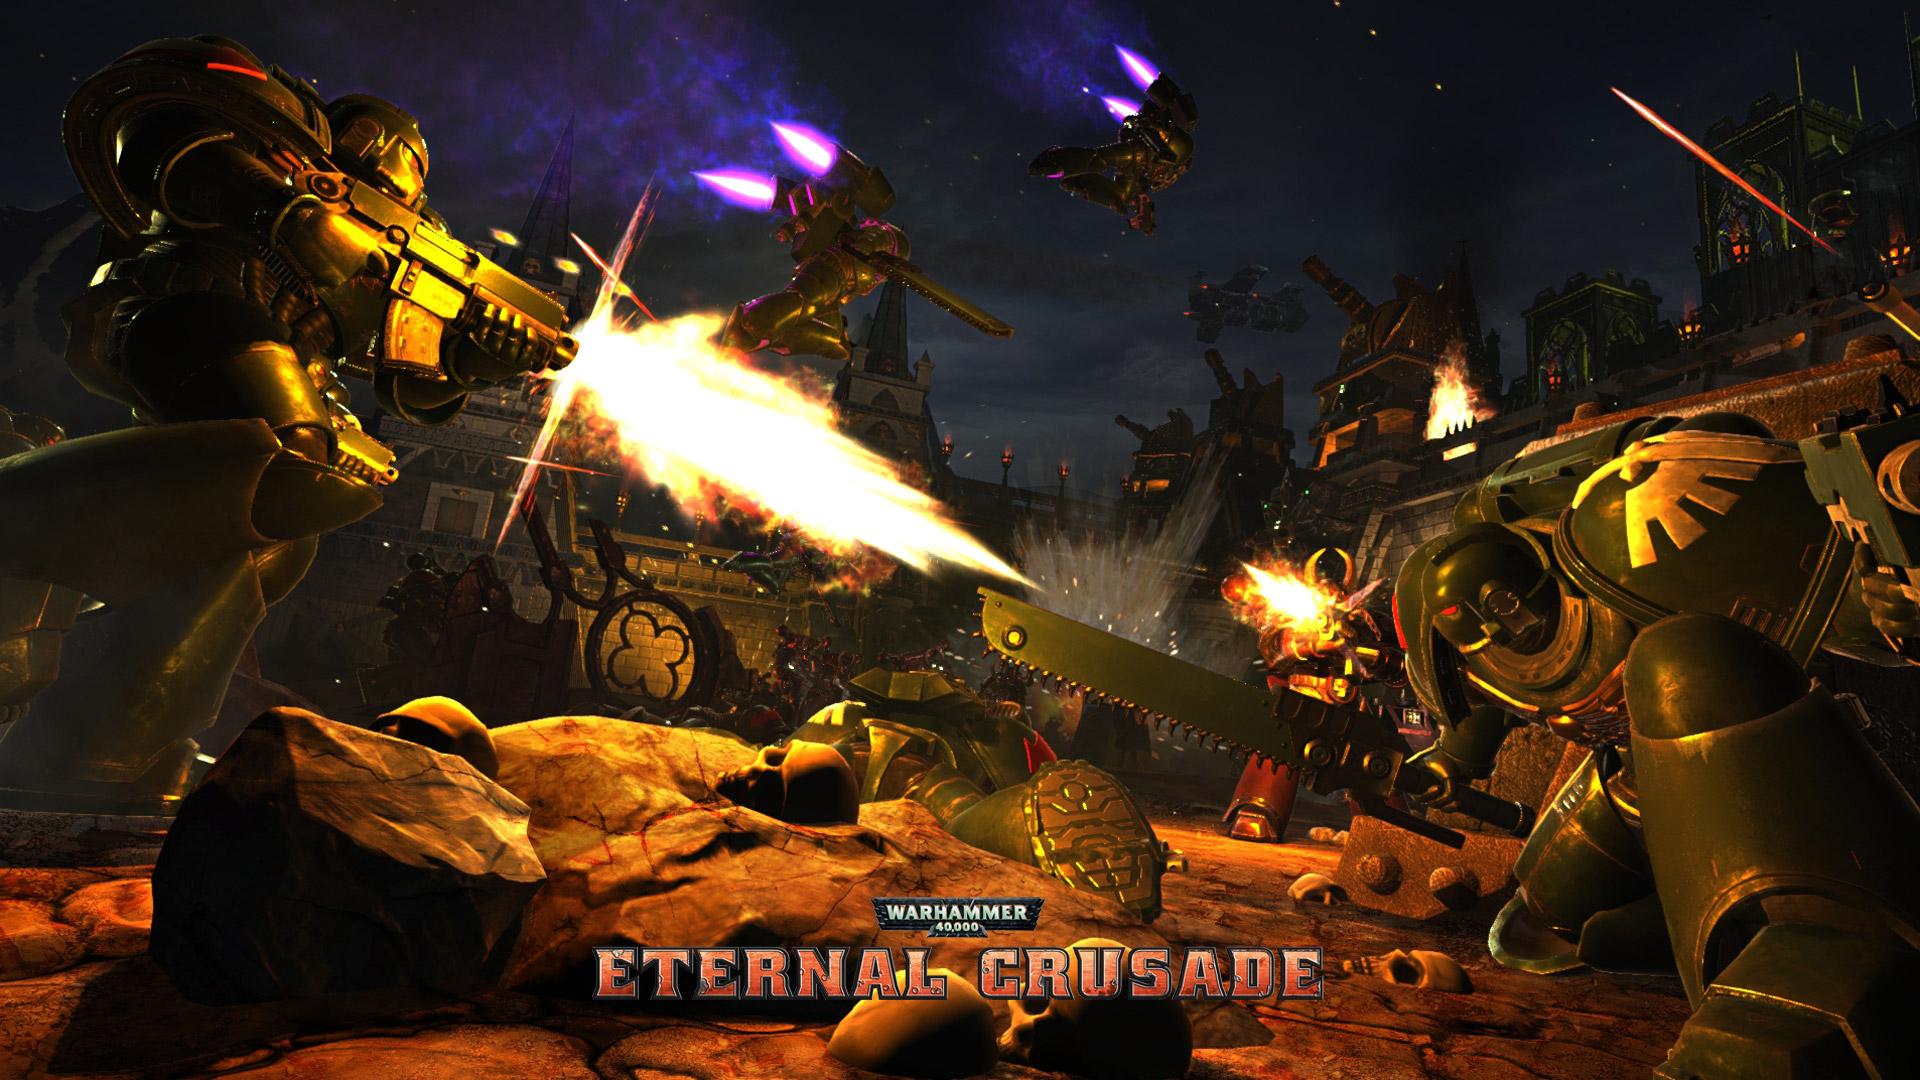 Free Warhammer 40,000: Eternal Crusade Wallpaper in 1920x1080